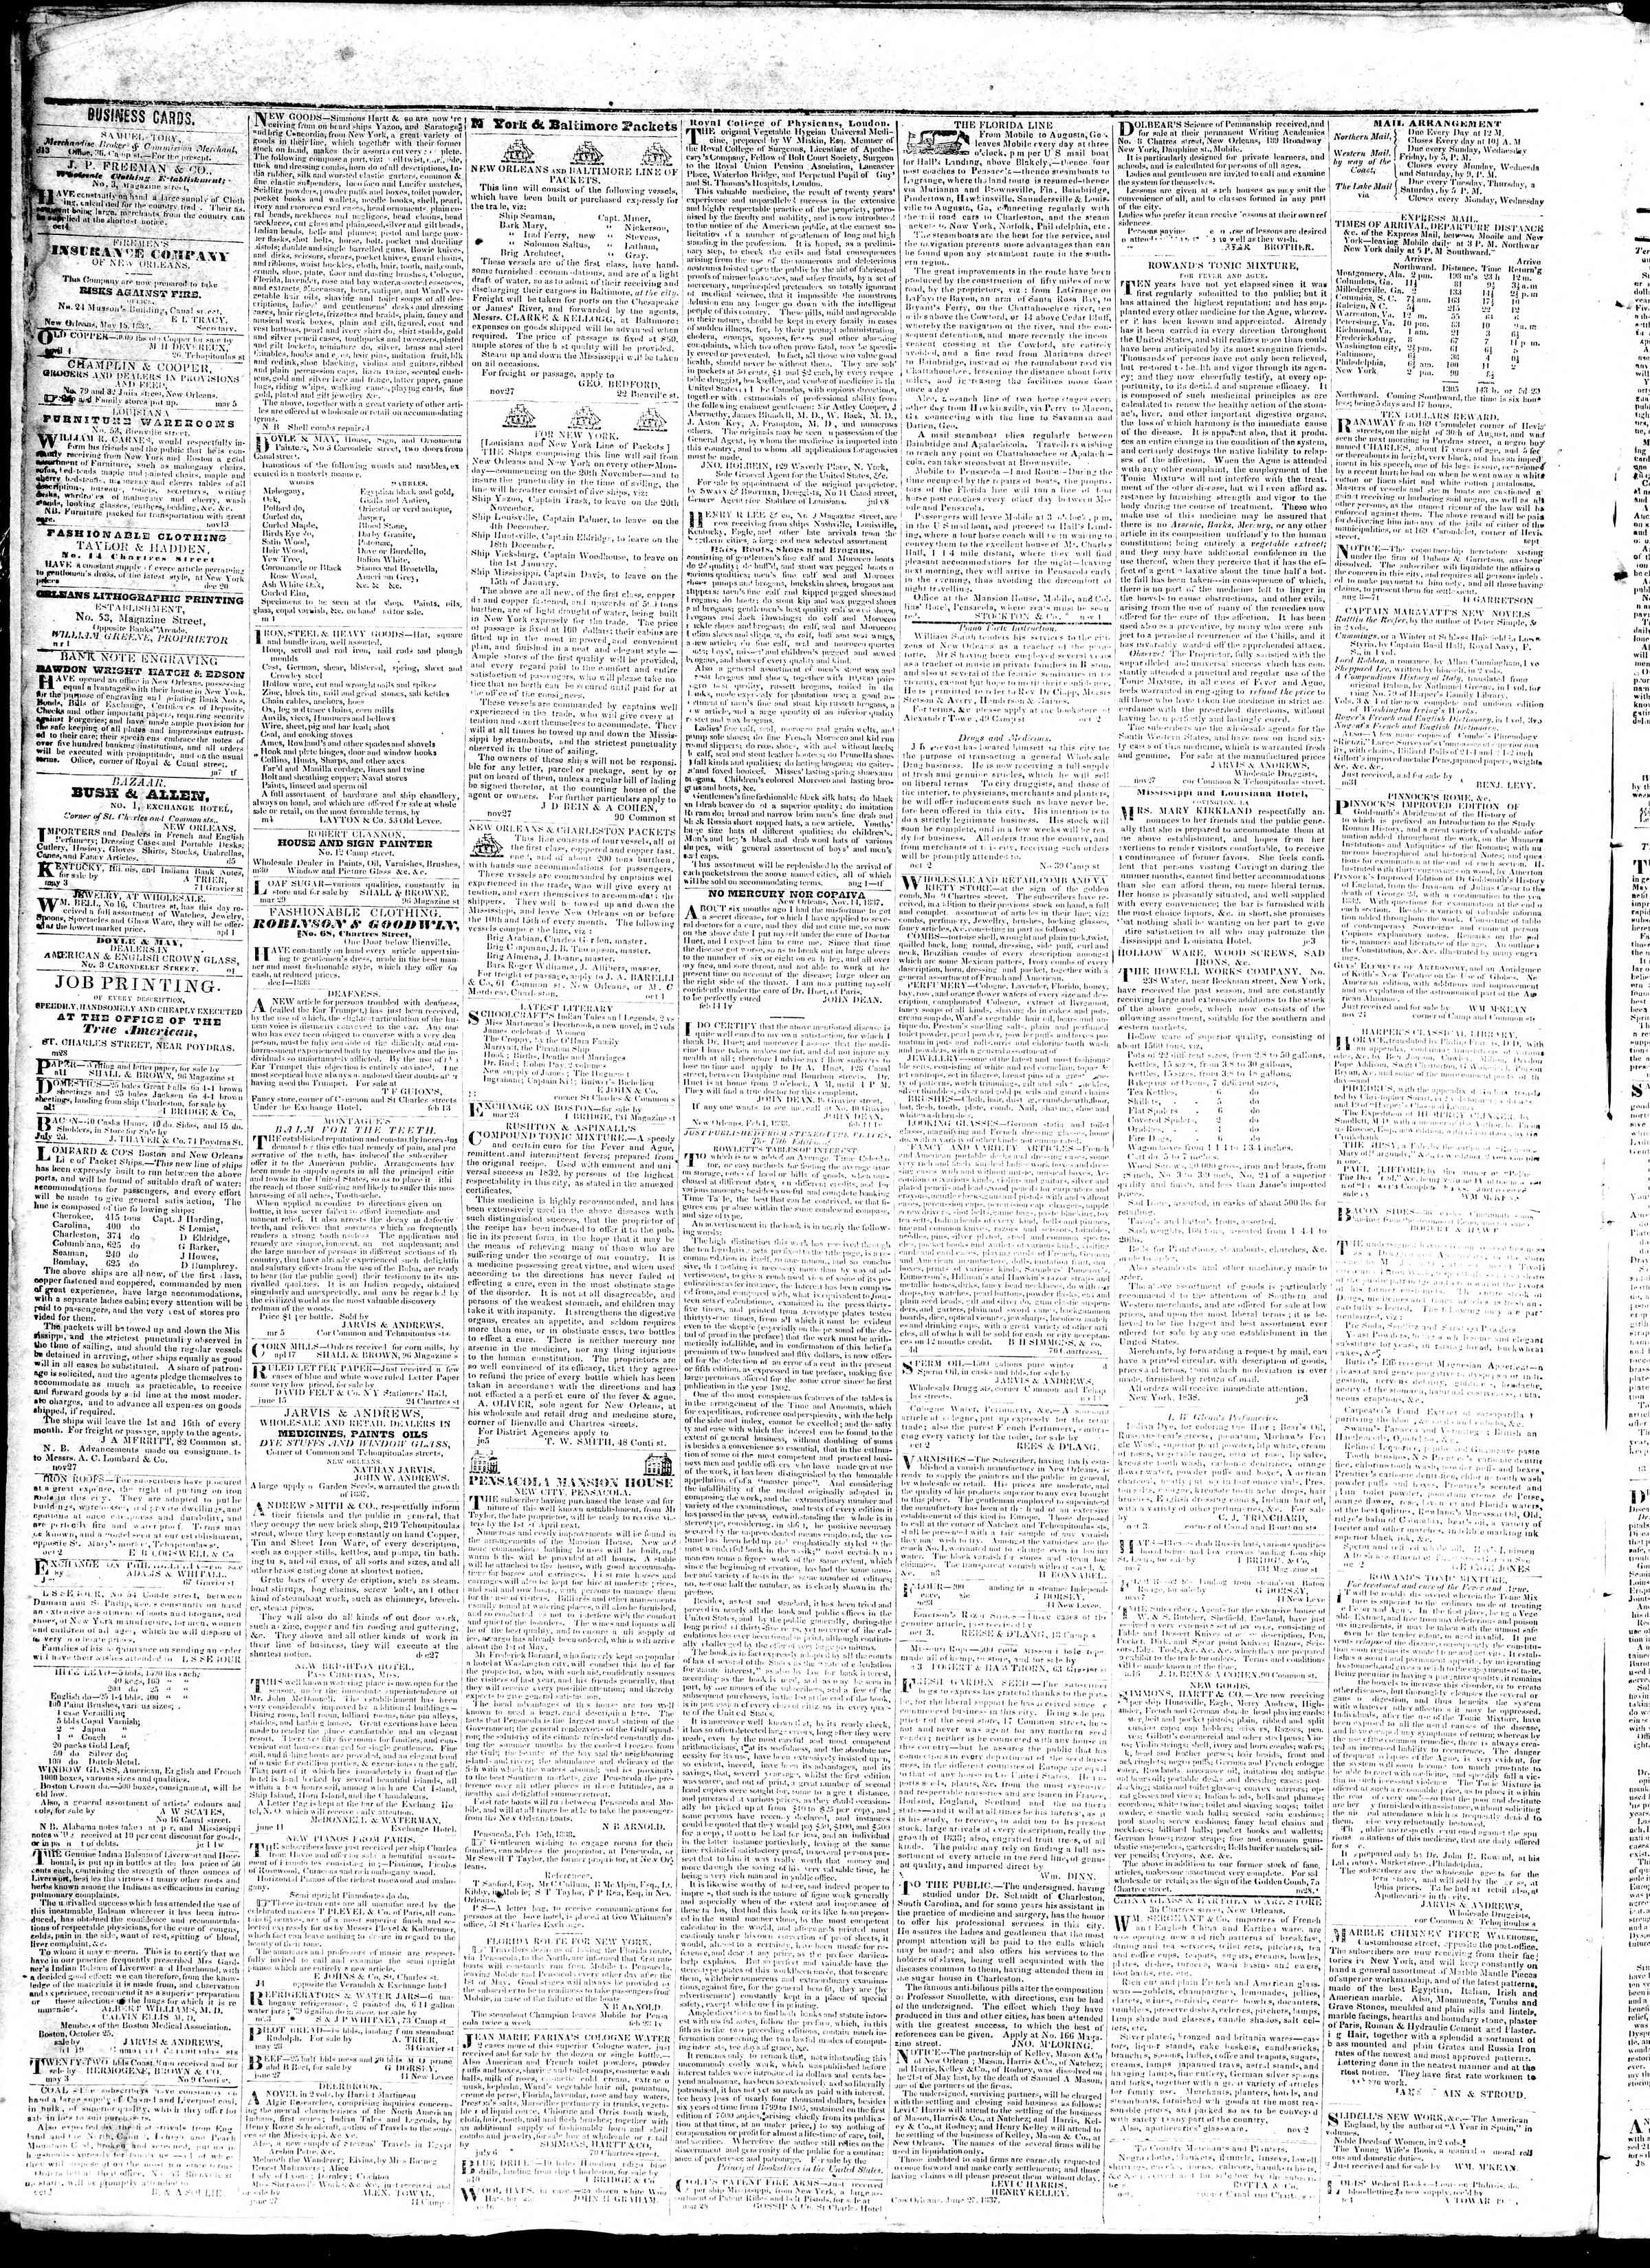 October 5, 1839 Tarihli True American Gazetesi Sayfa 4